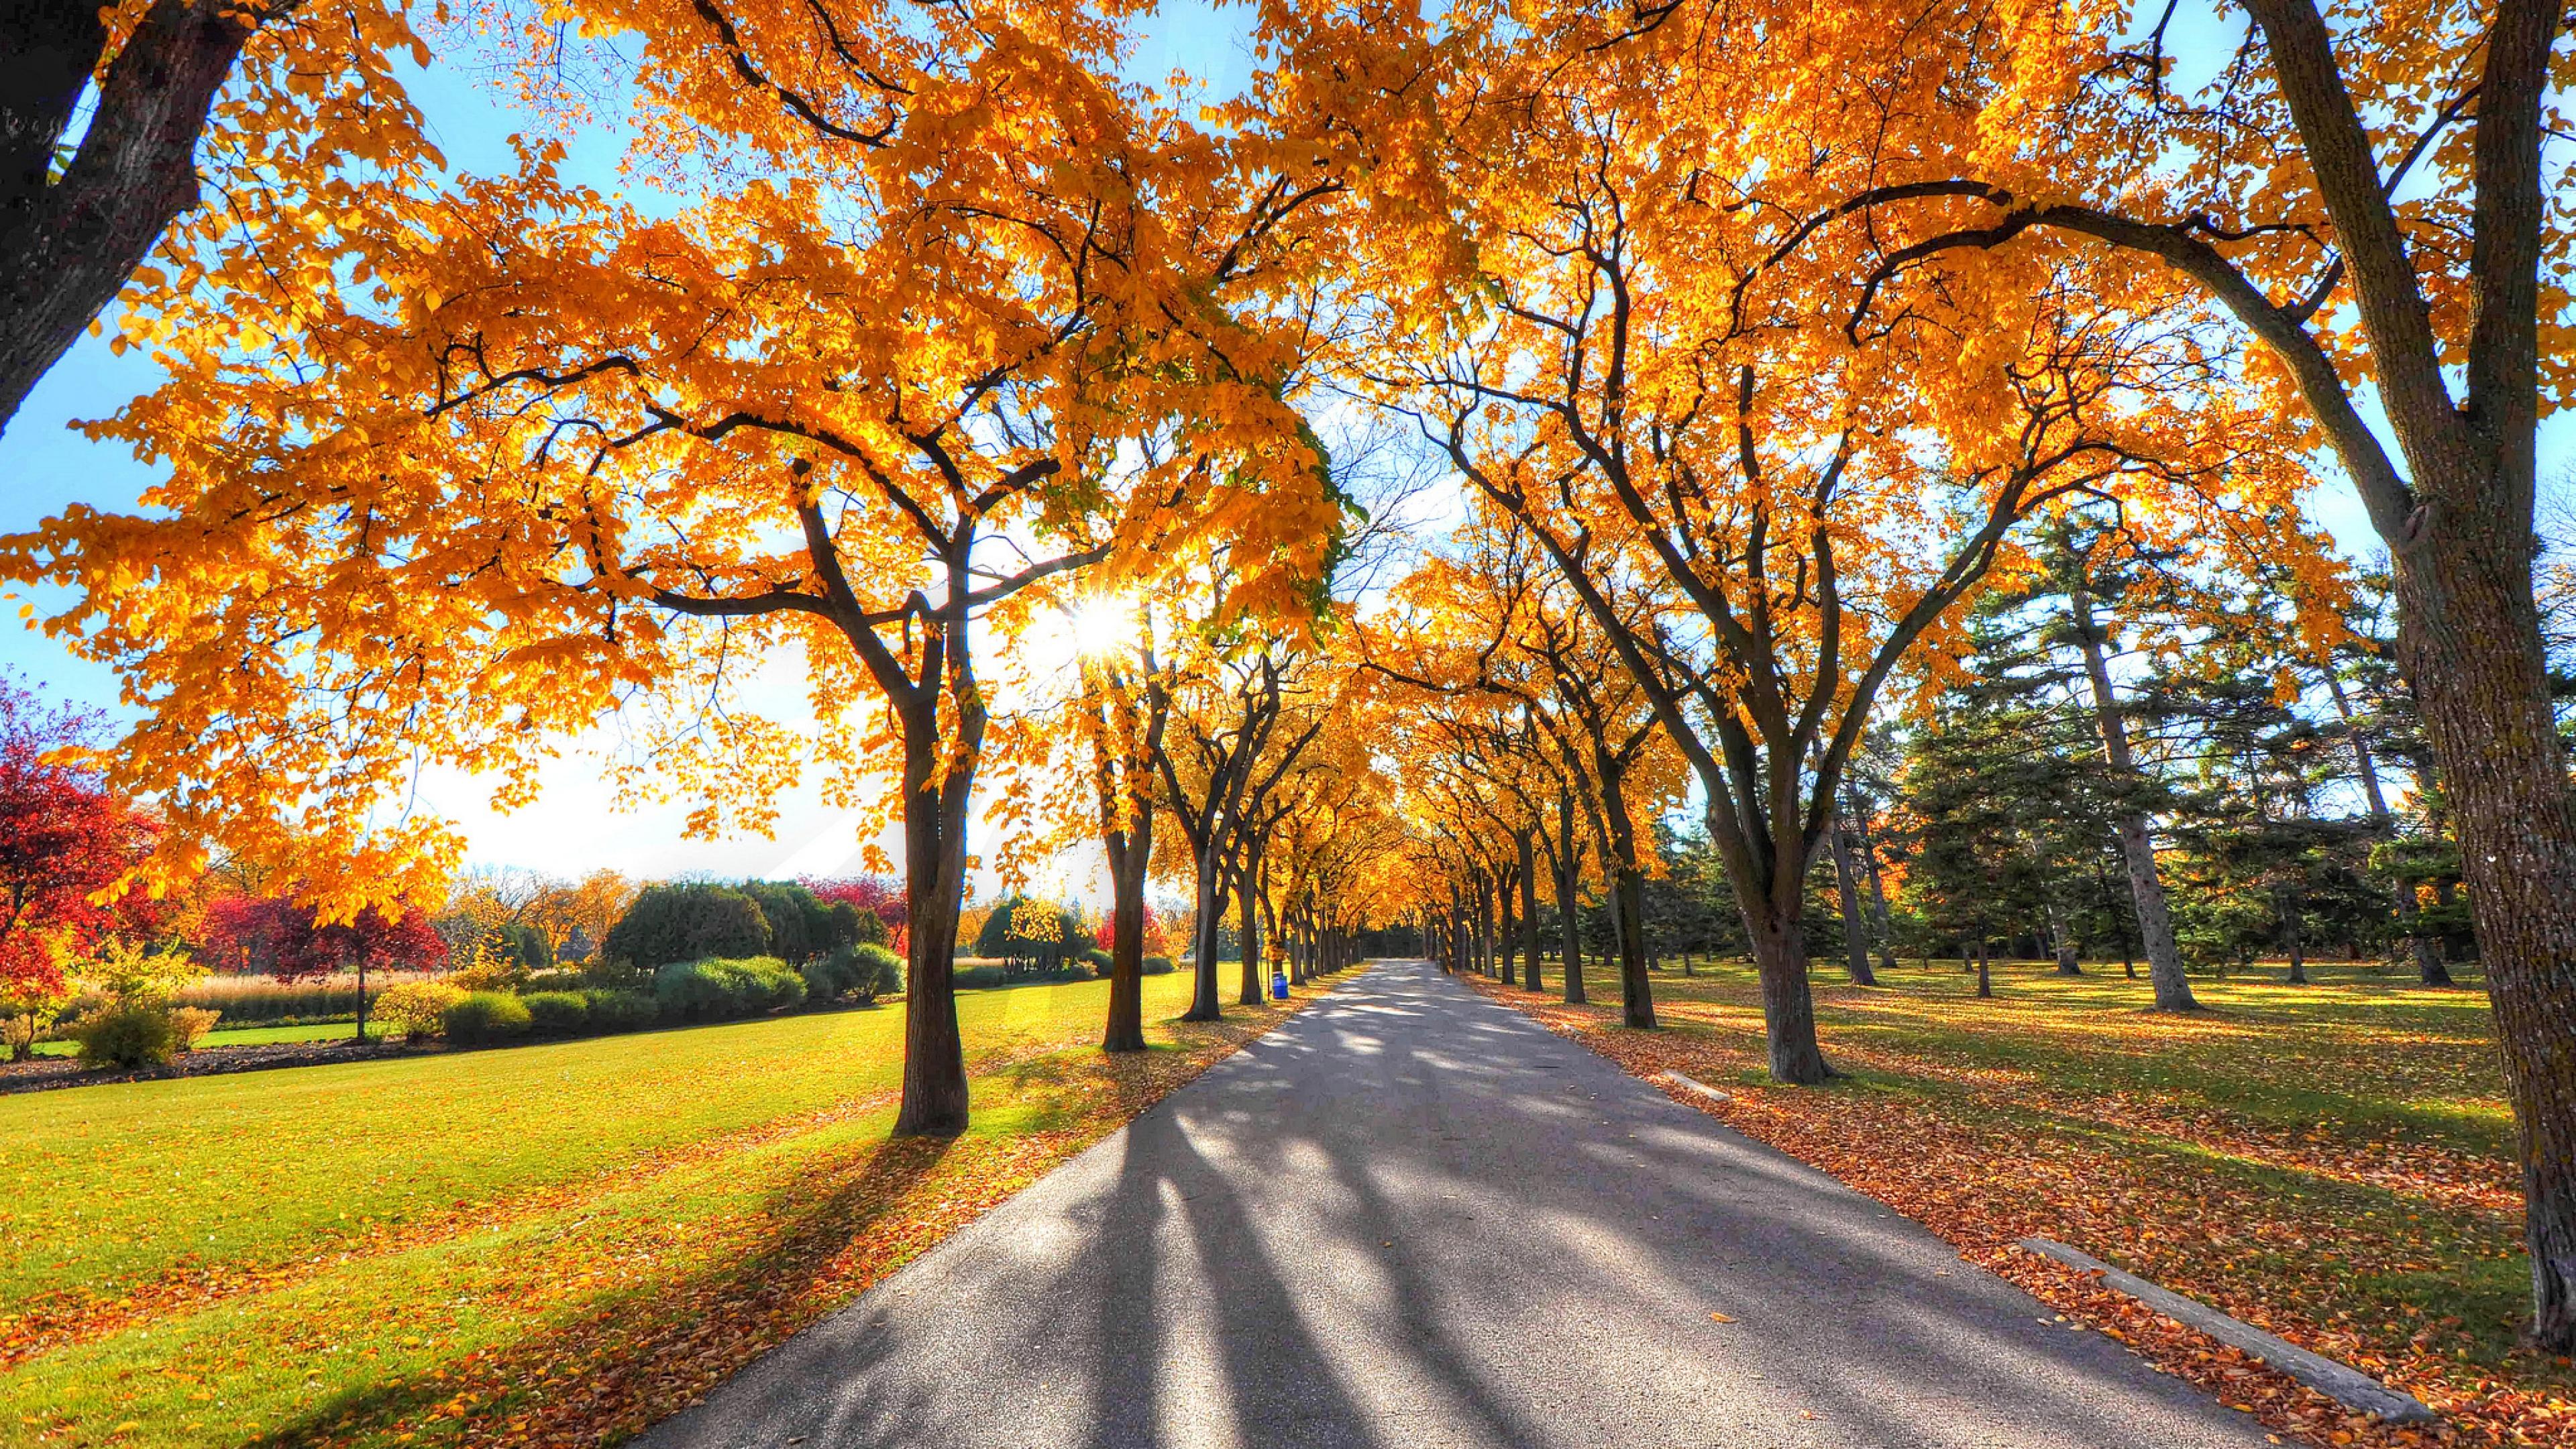 1280x720 autumn alley park 720p hd 4k wallpapers images